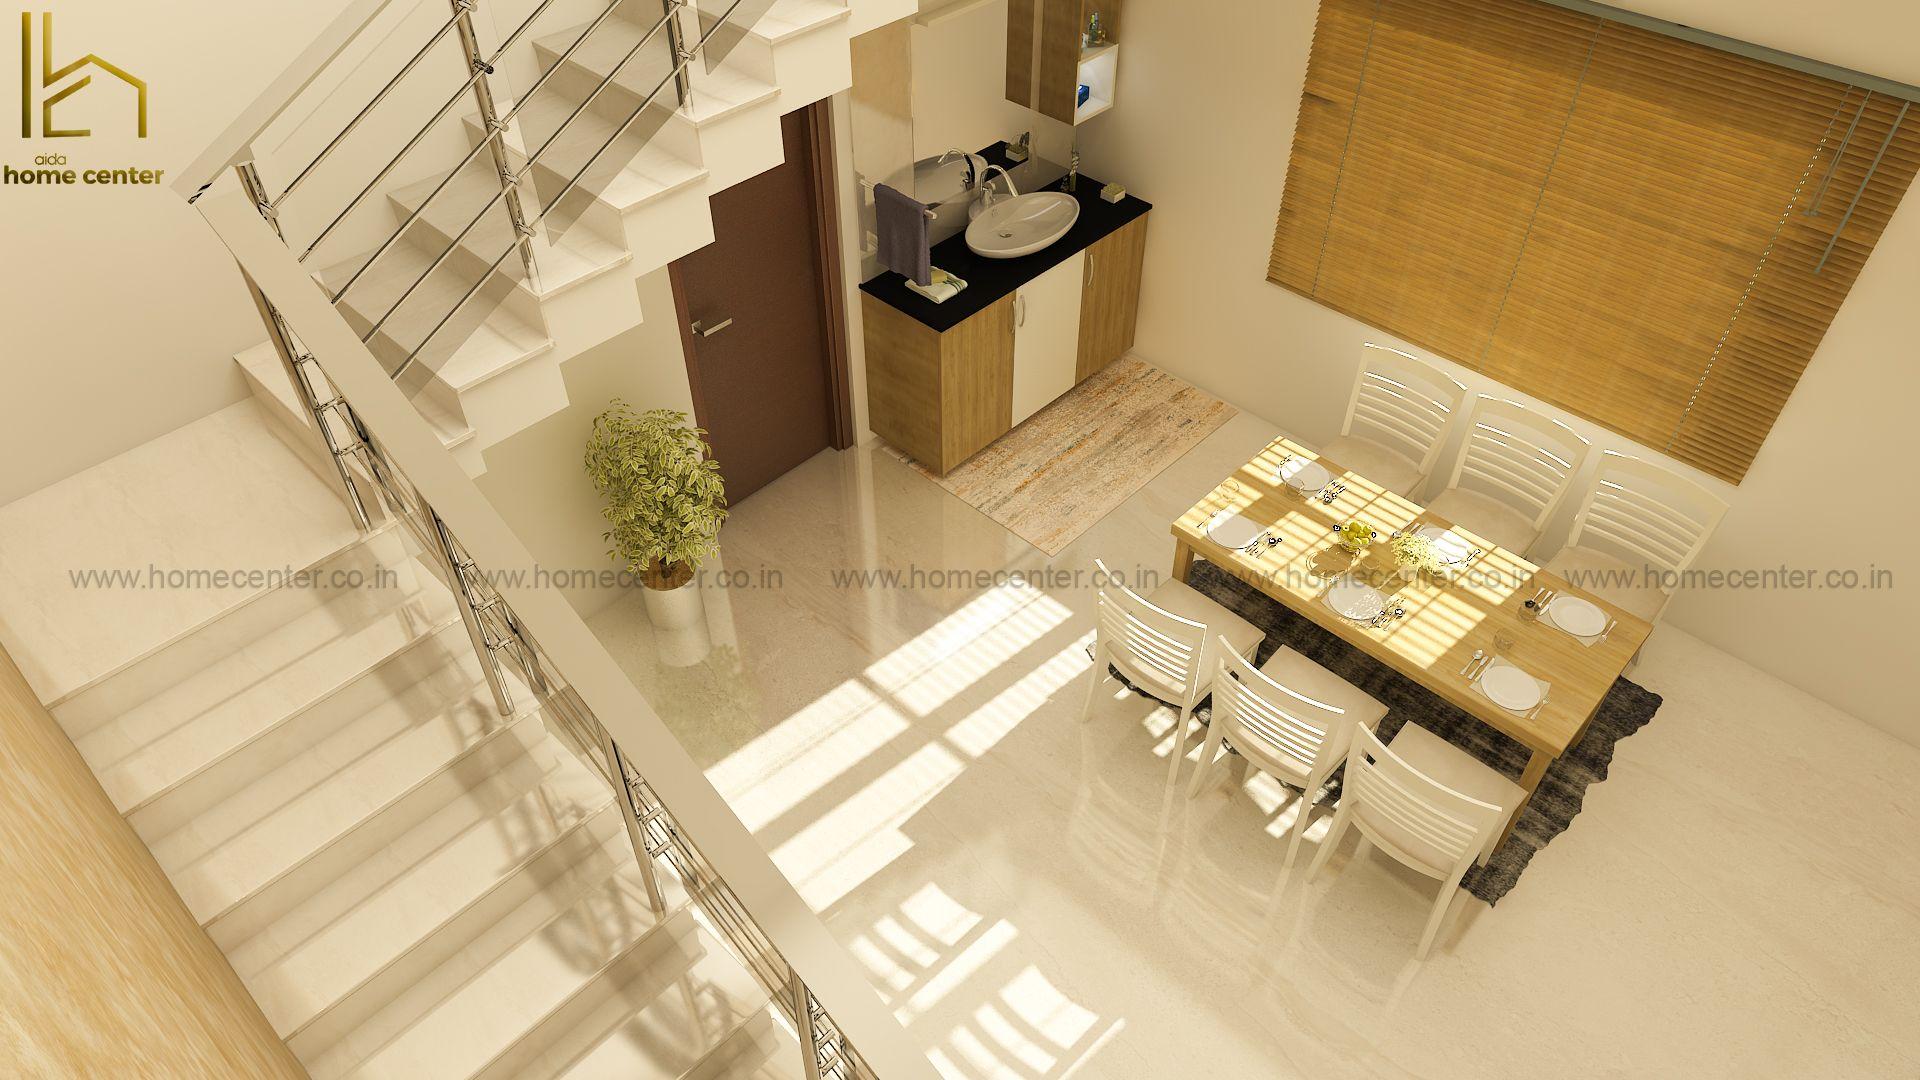 Home Center Provides 100 Customized Modular Kitchen Interiors